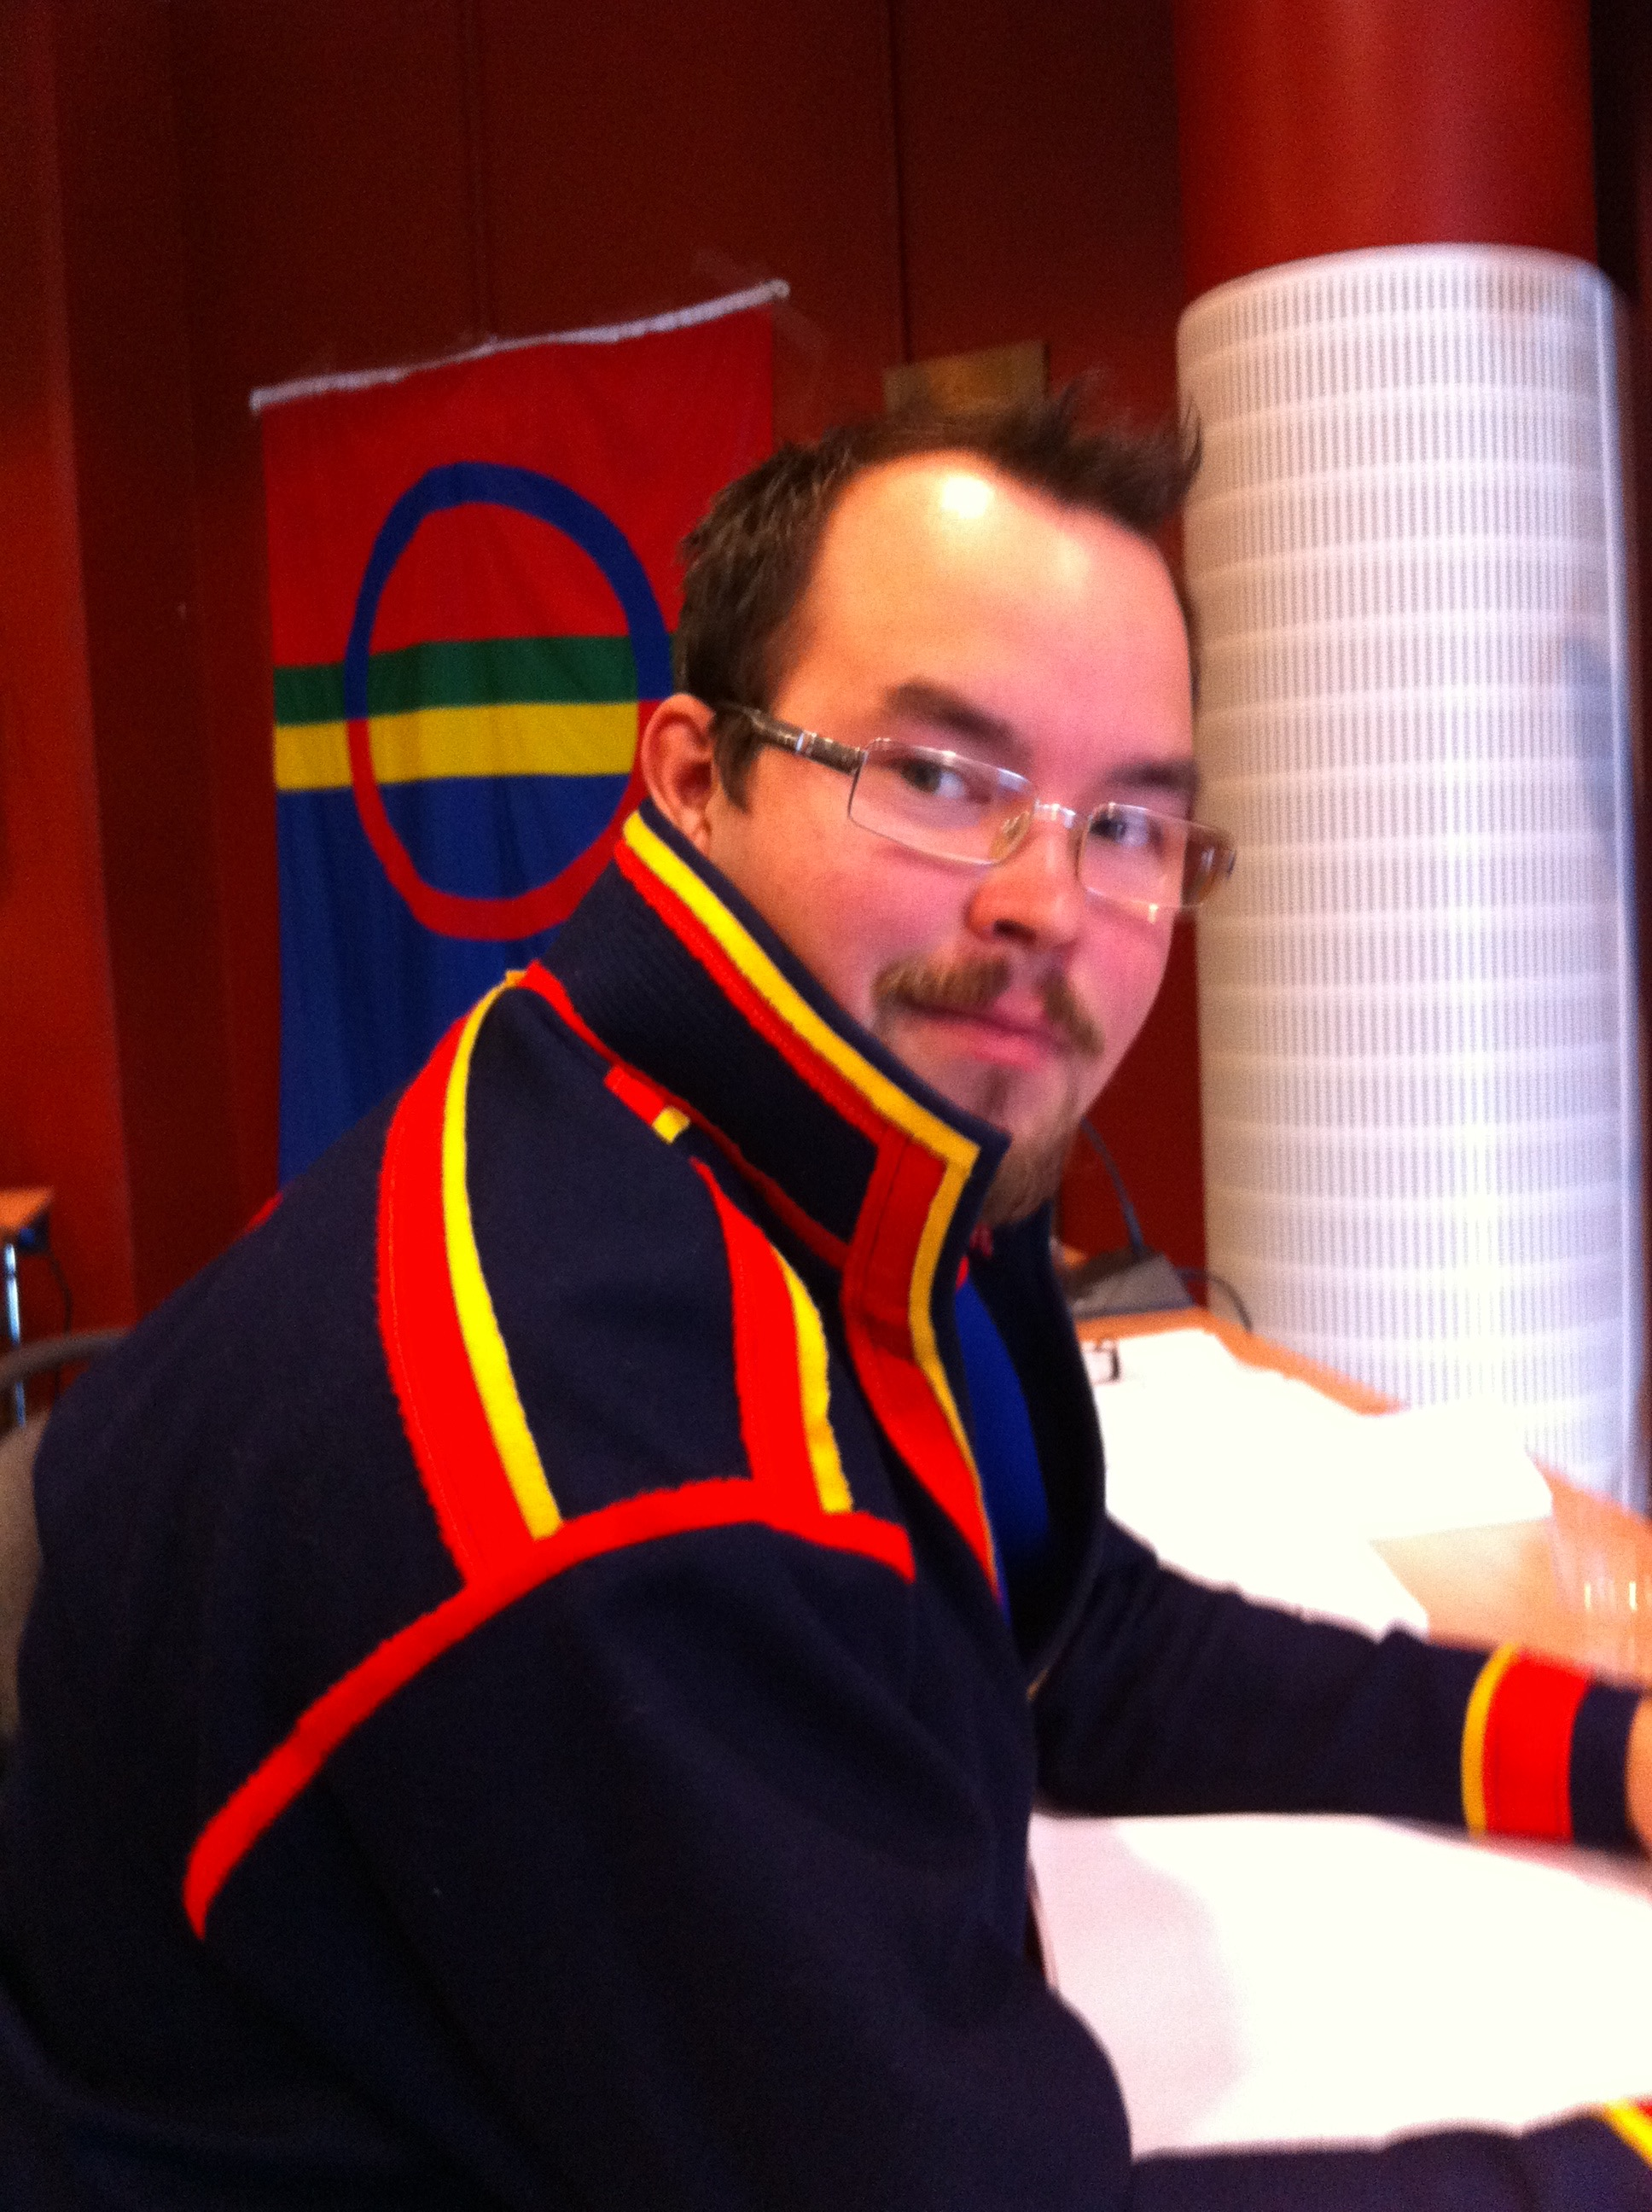 Sametingets ny-valda plenum i Kiruna inleder sitt arbete